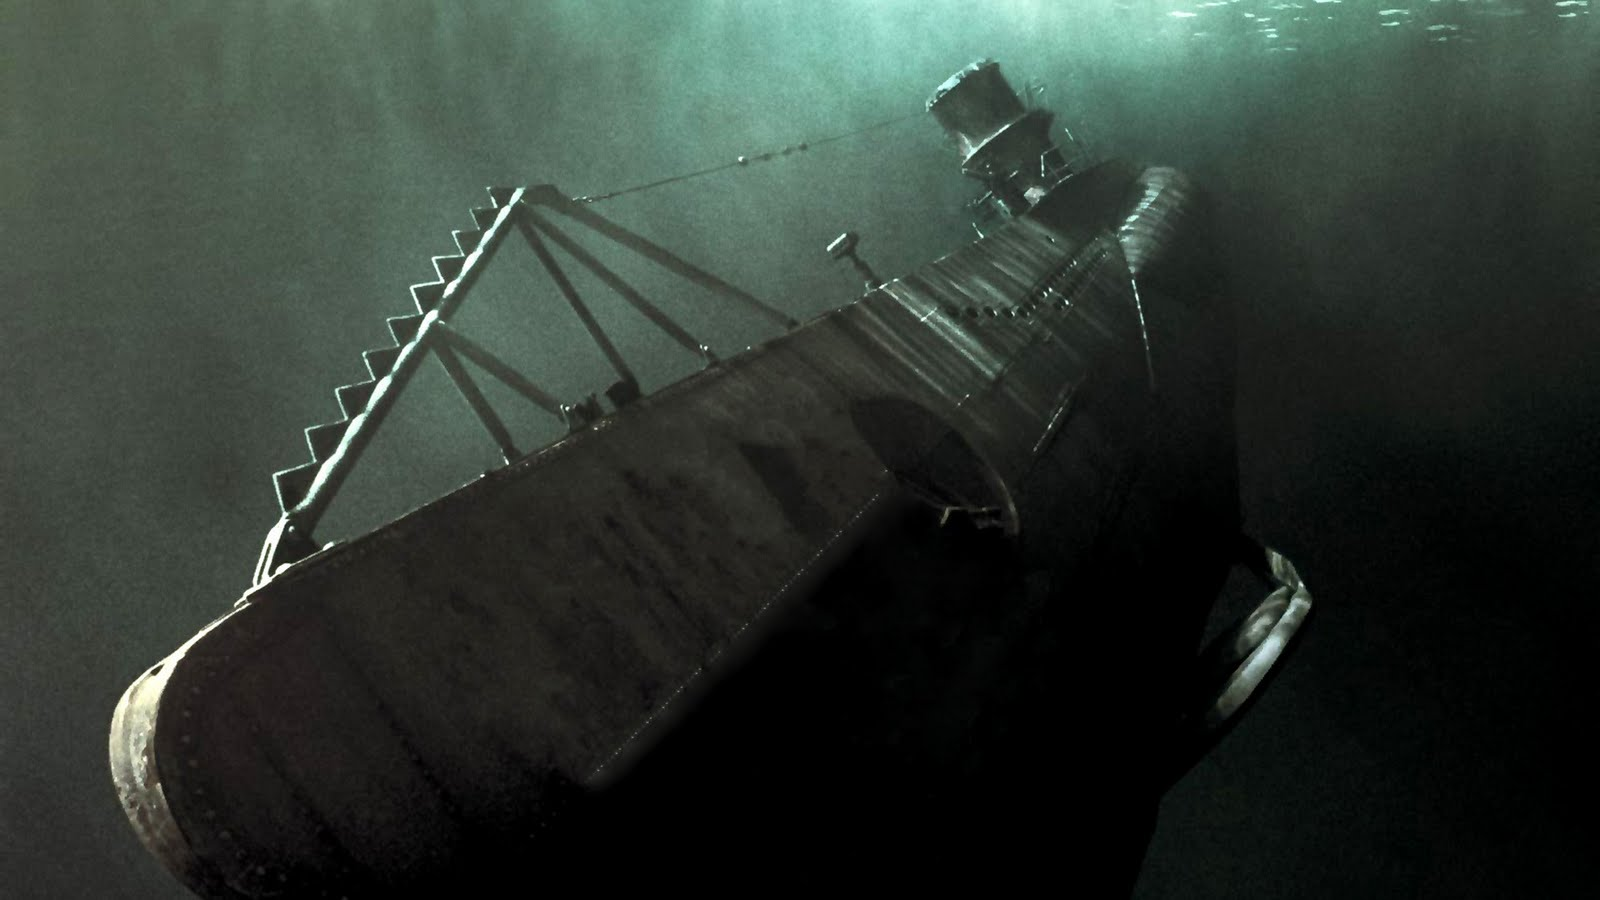 http://3.bp.blogspot.com/_bQY56Uy2fEg/TNadvsXEtnI/AAAAAAAAEZY/1Jm1xV_jZtY/s1600/Ponorka+U-571+Wallpaper+%284%29.jpg